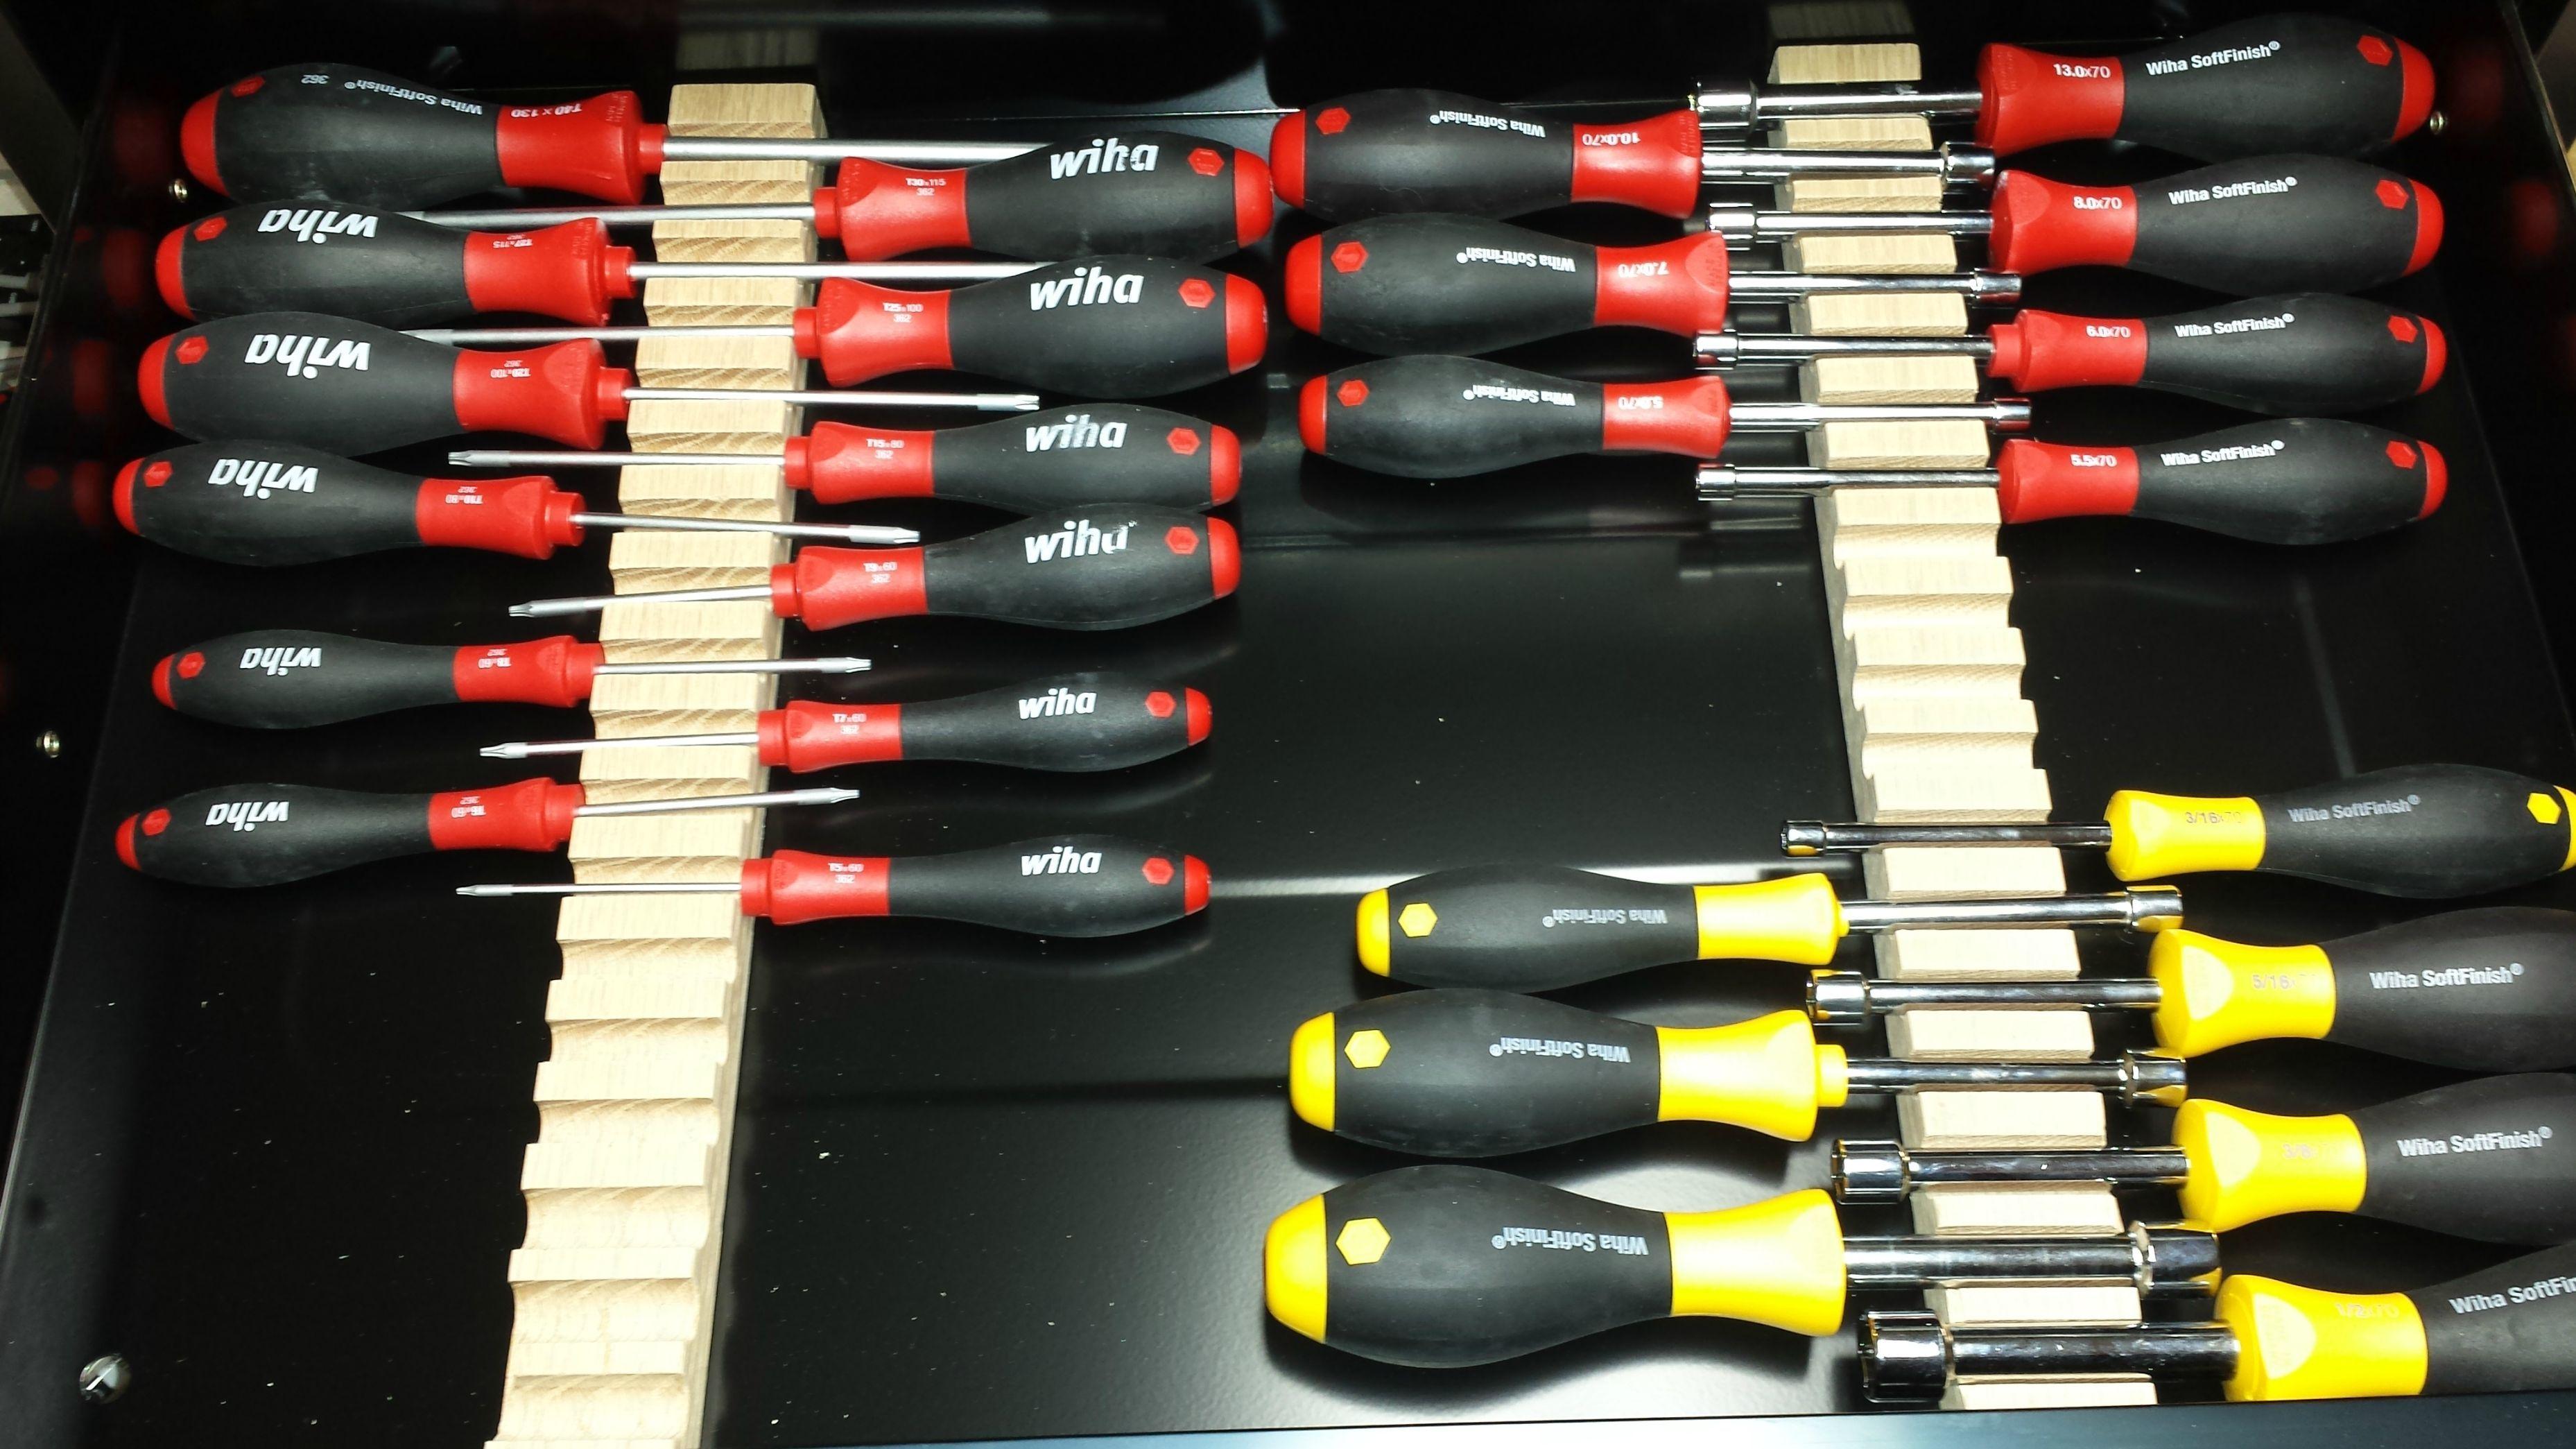 DIY Screwdriver Storage  idea rip slot and add